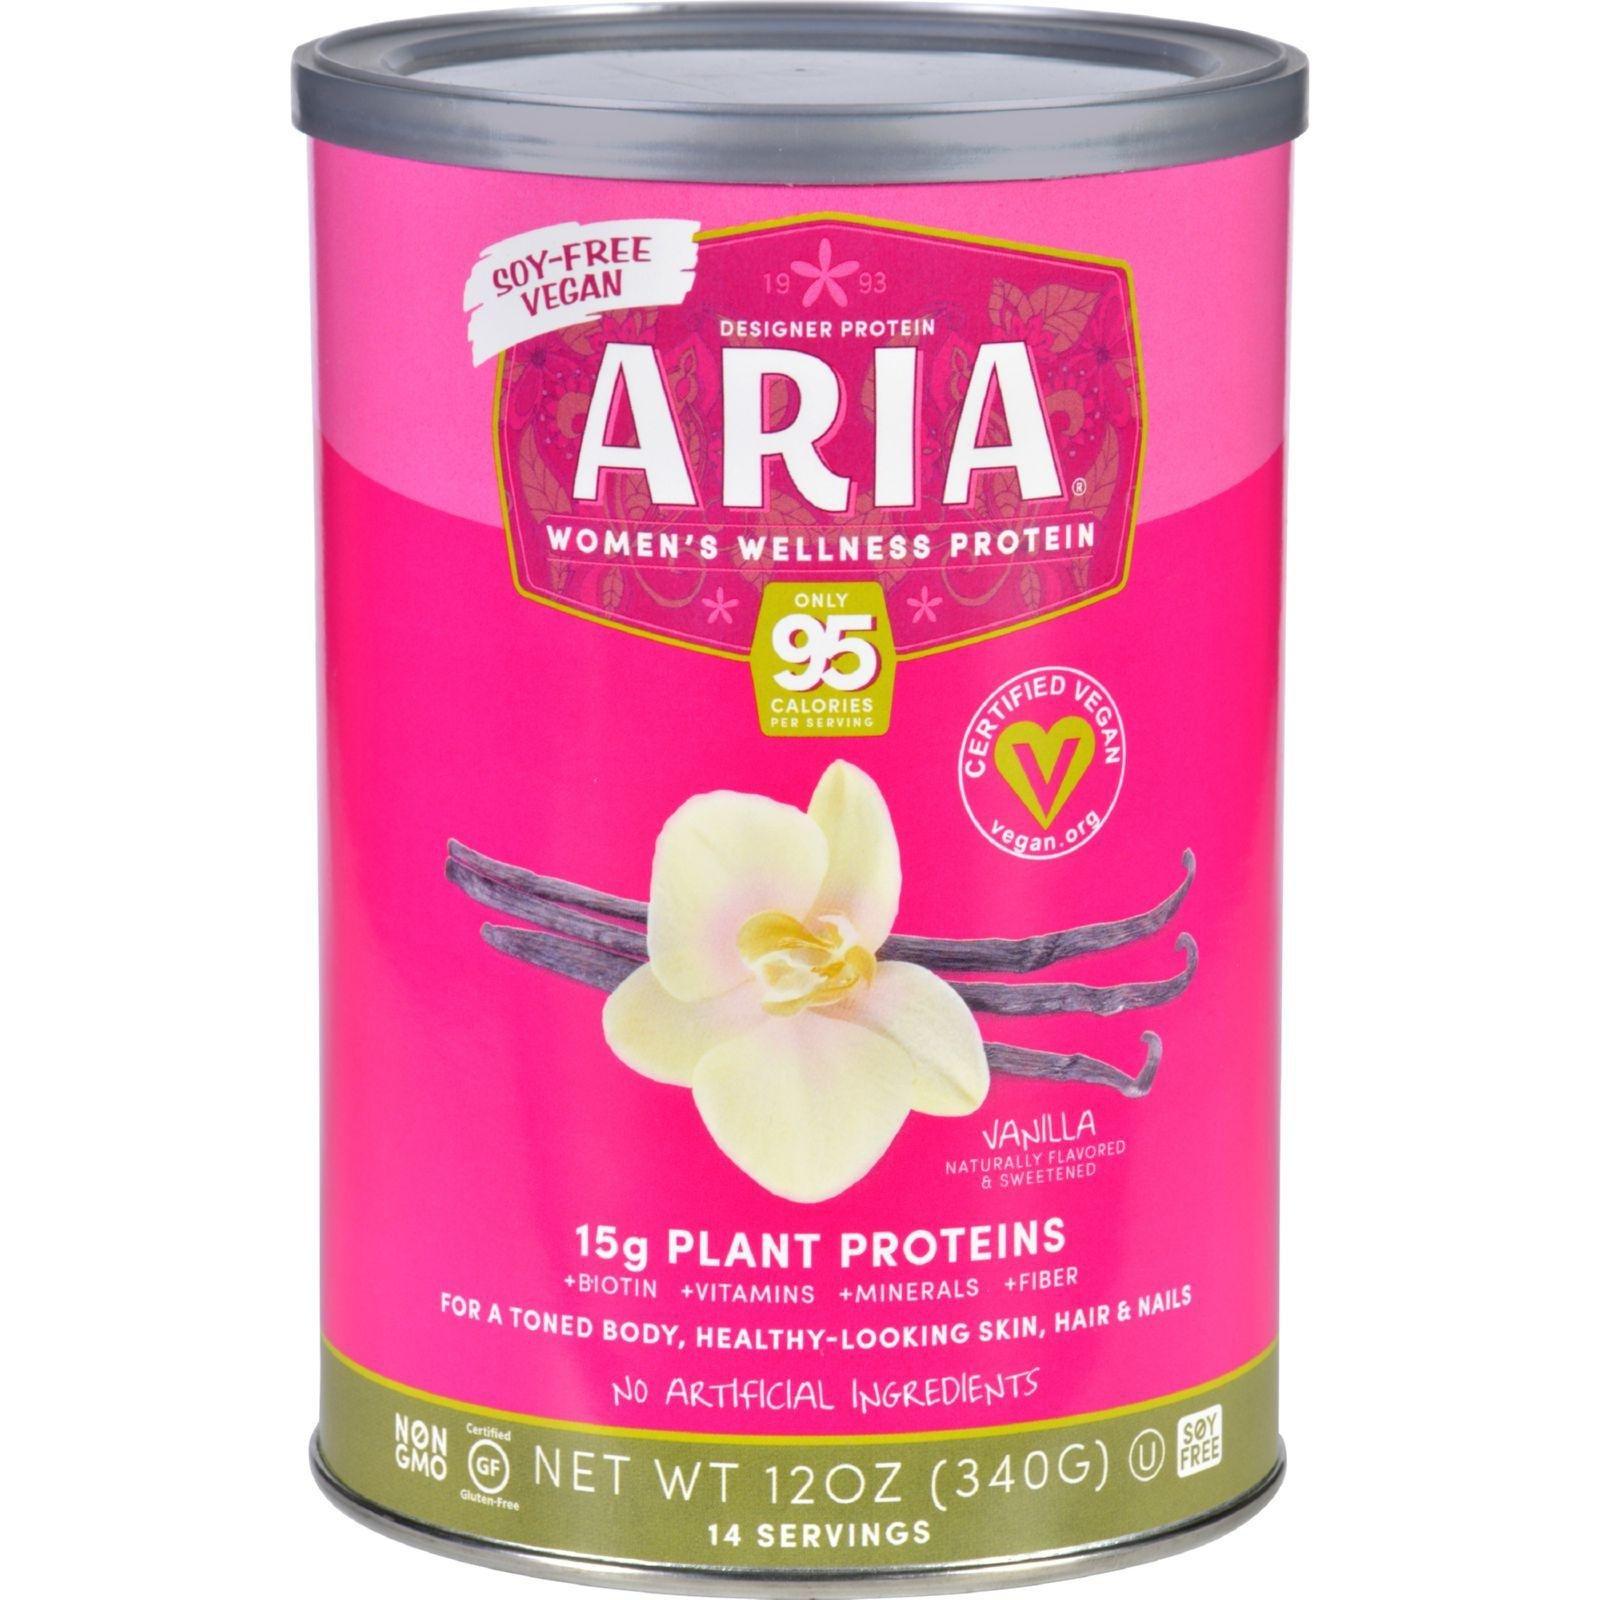 Designer Whey Aria Womens Wellness Protein Powder